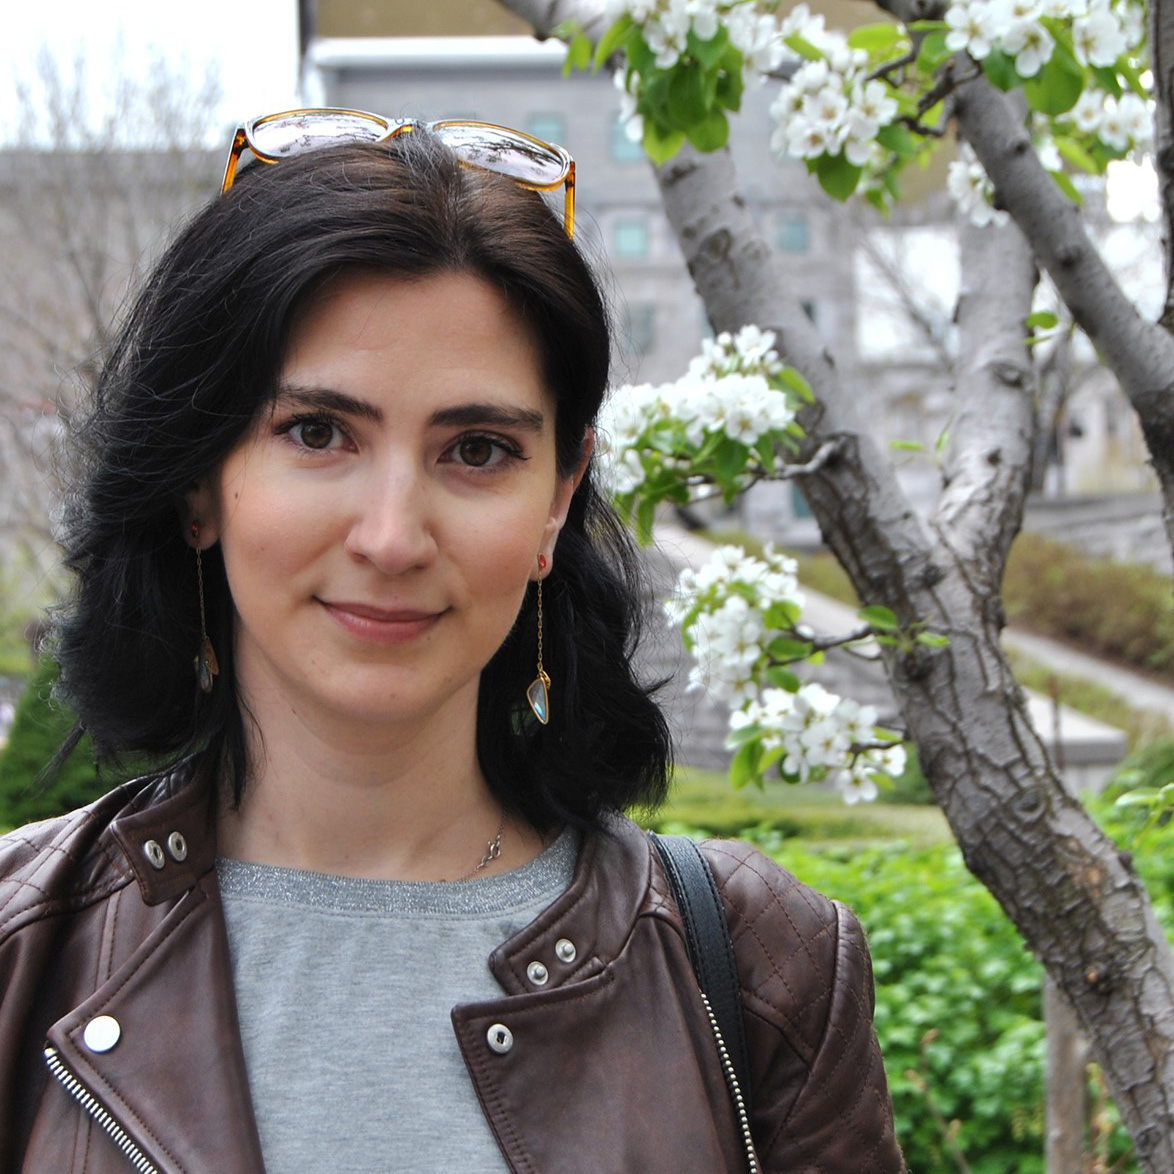 Yulia Kovaleva is a Web Designer & Developer from Toronto, ON.